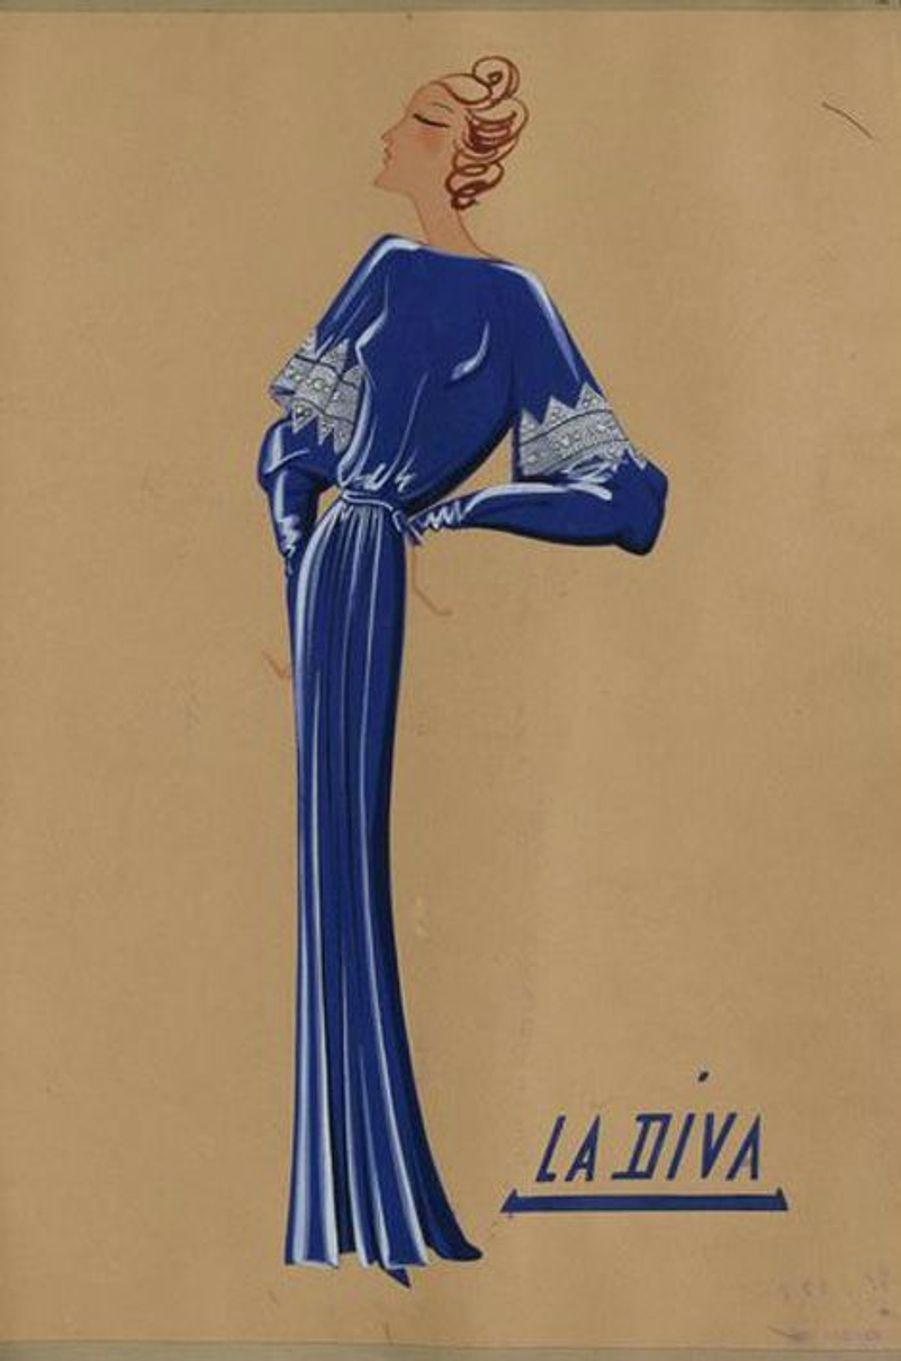 La Diva, 1935